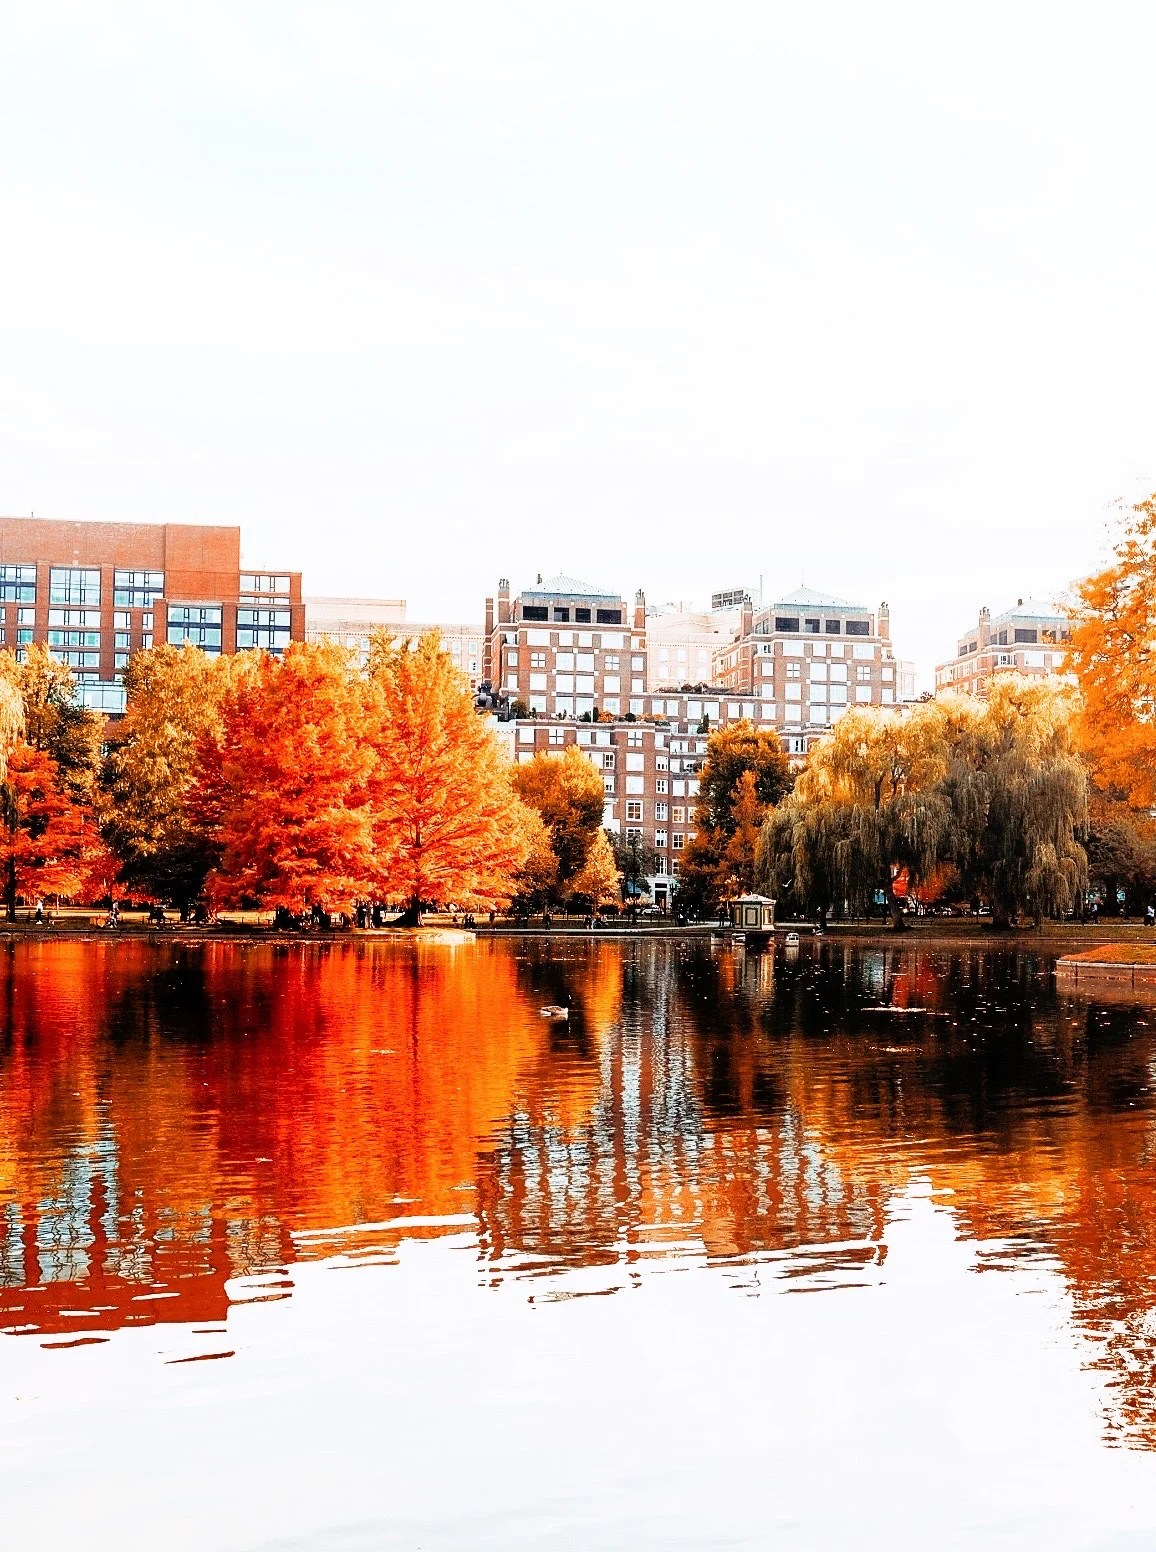 Boston Massachusetts in the Fall